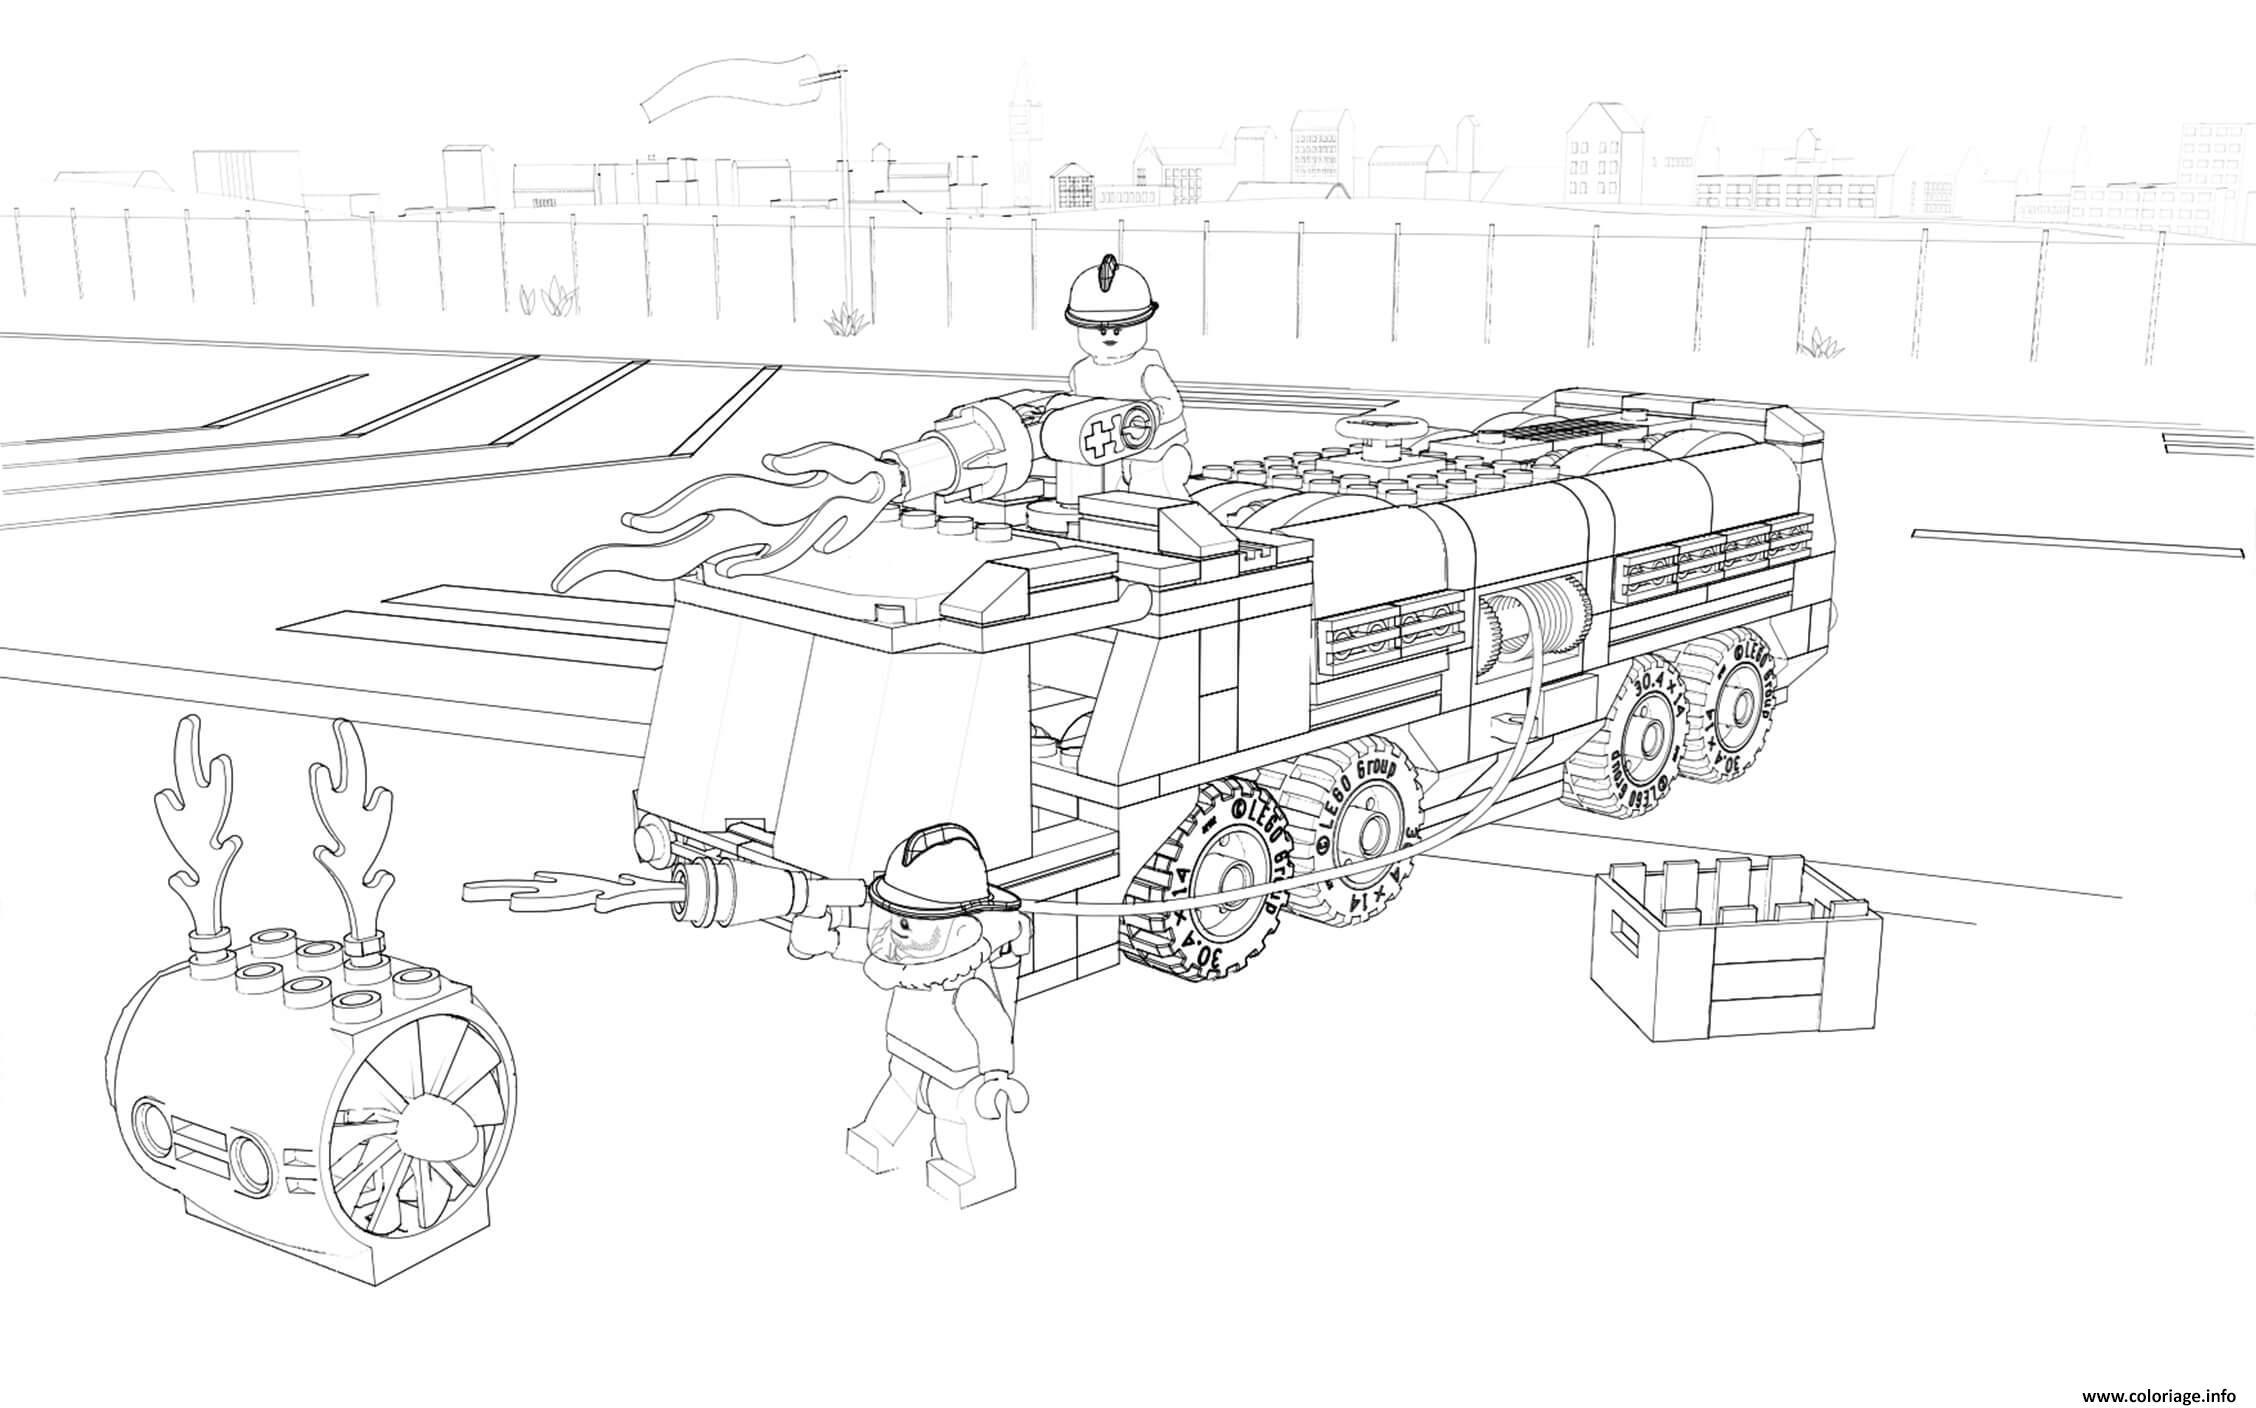 Dessin Lego City Firefighter Fire Truck Coloriage Gratuit à Imprimer